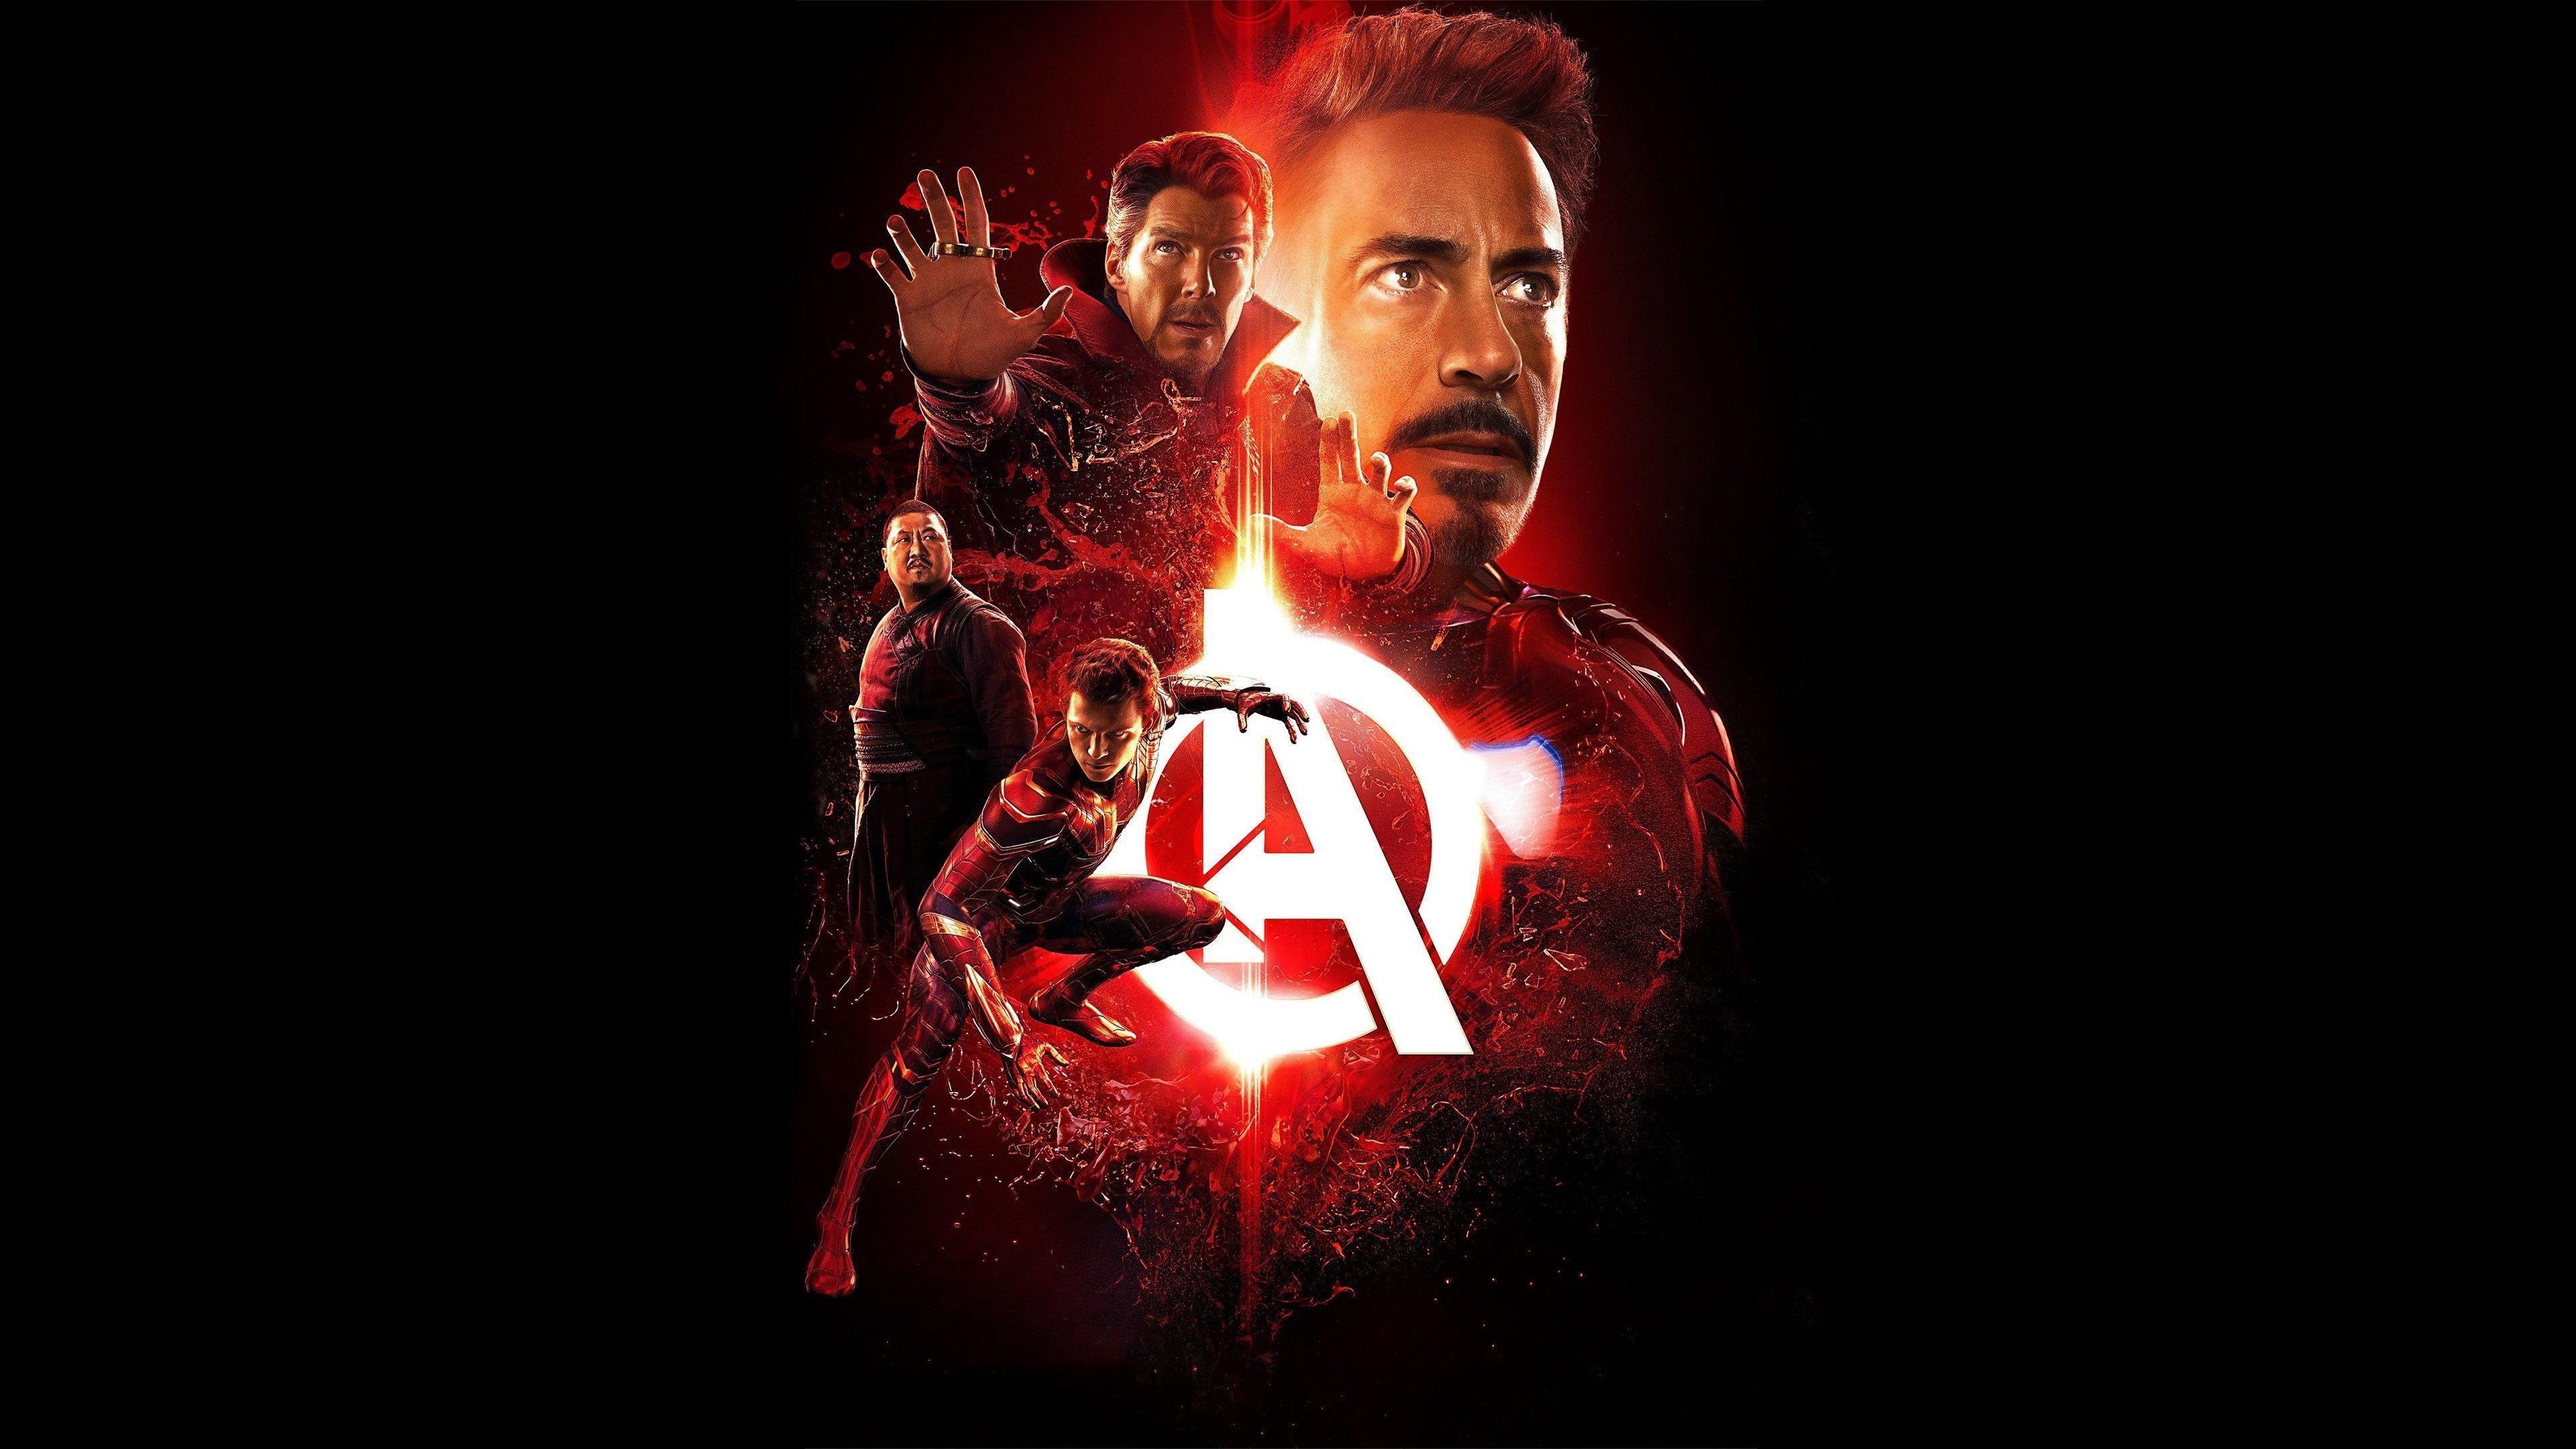 Avengers Infinity War 4k Wallpapers Top Free Avengers Infinity War 4k Backgrounds Wallpaperaccess